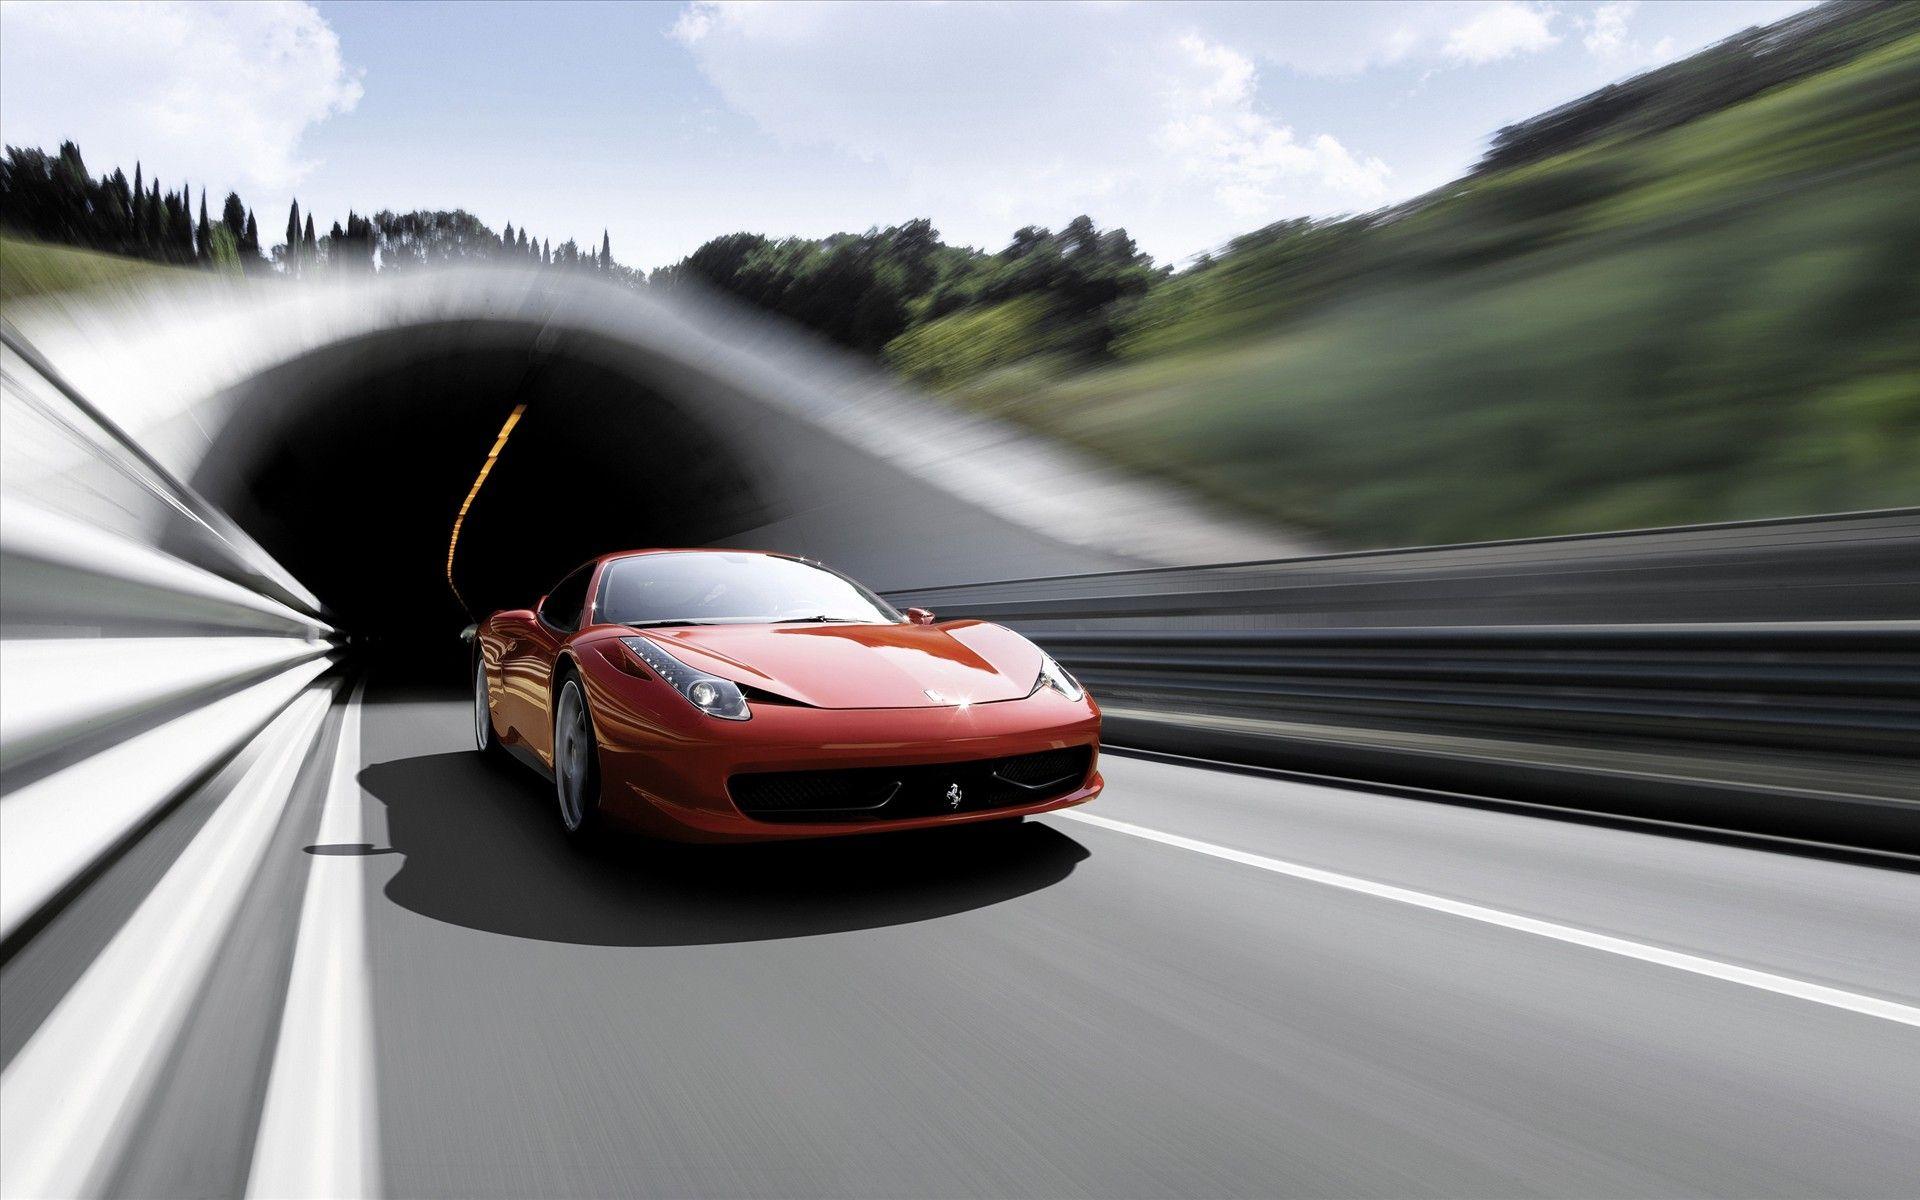 Ferrari 458 Italia On Highway HD Widescreen Wallpapers Sportcar